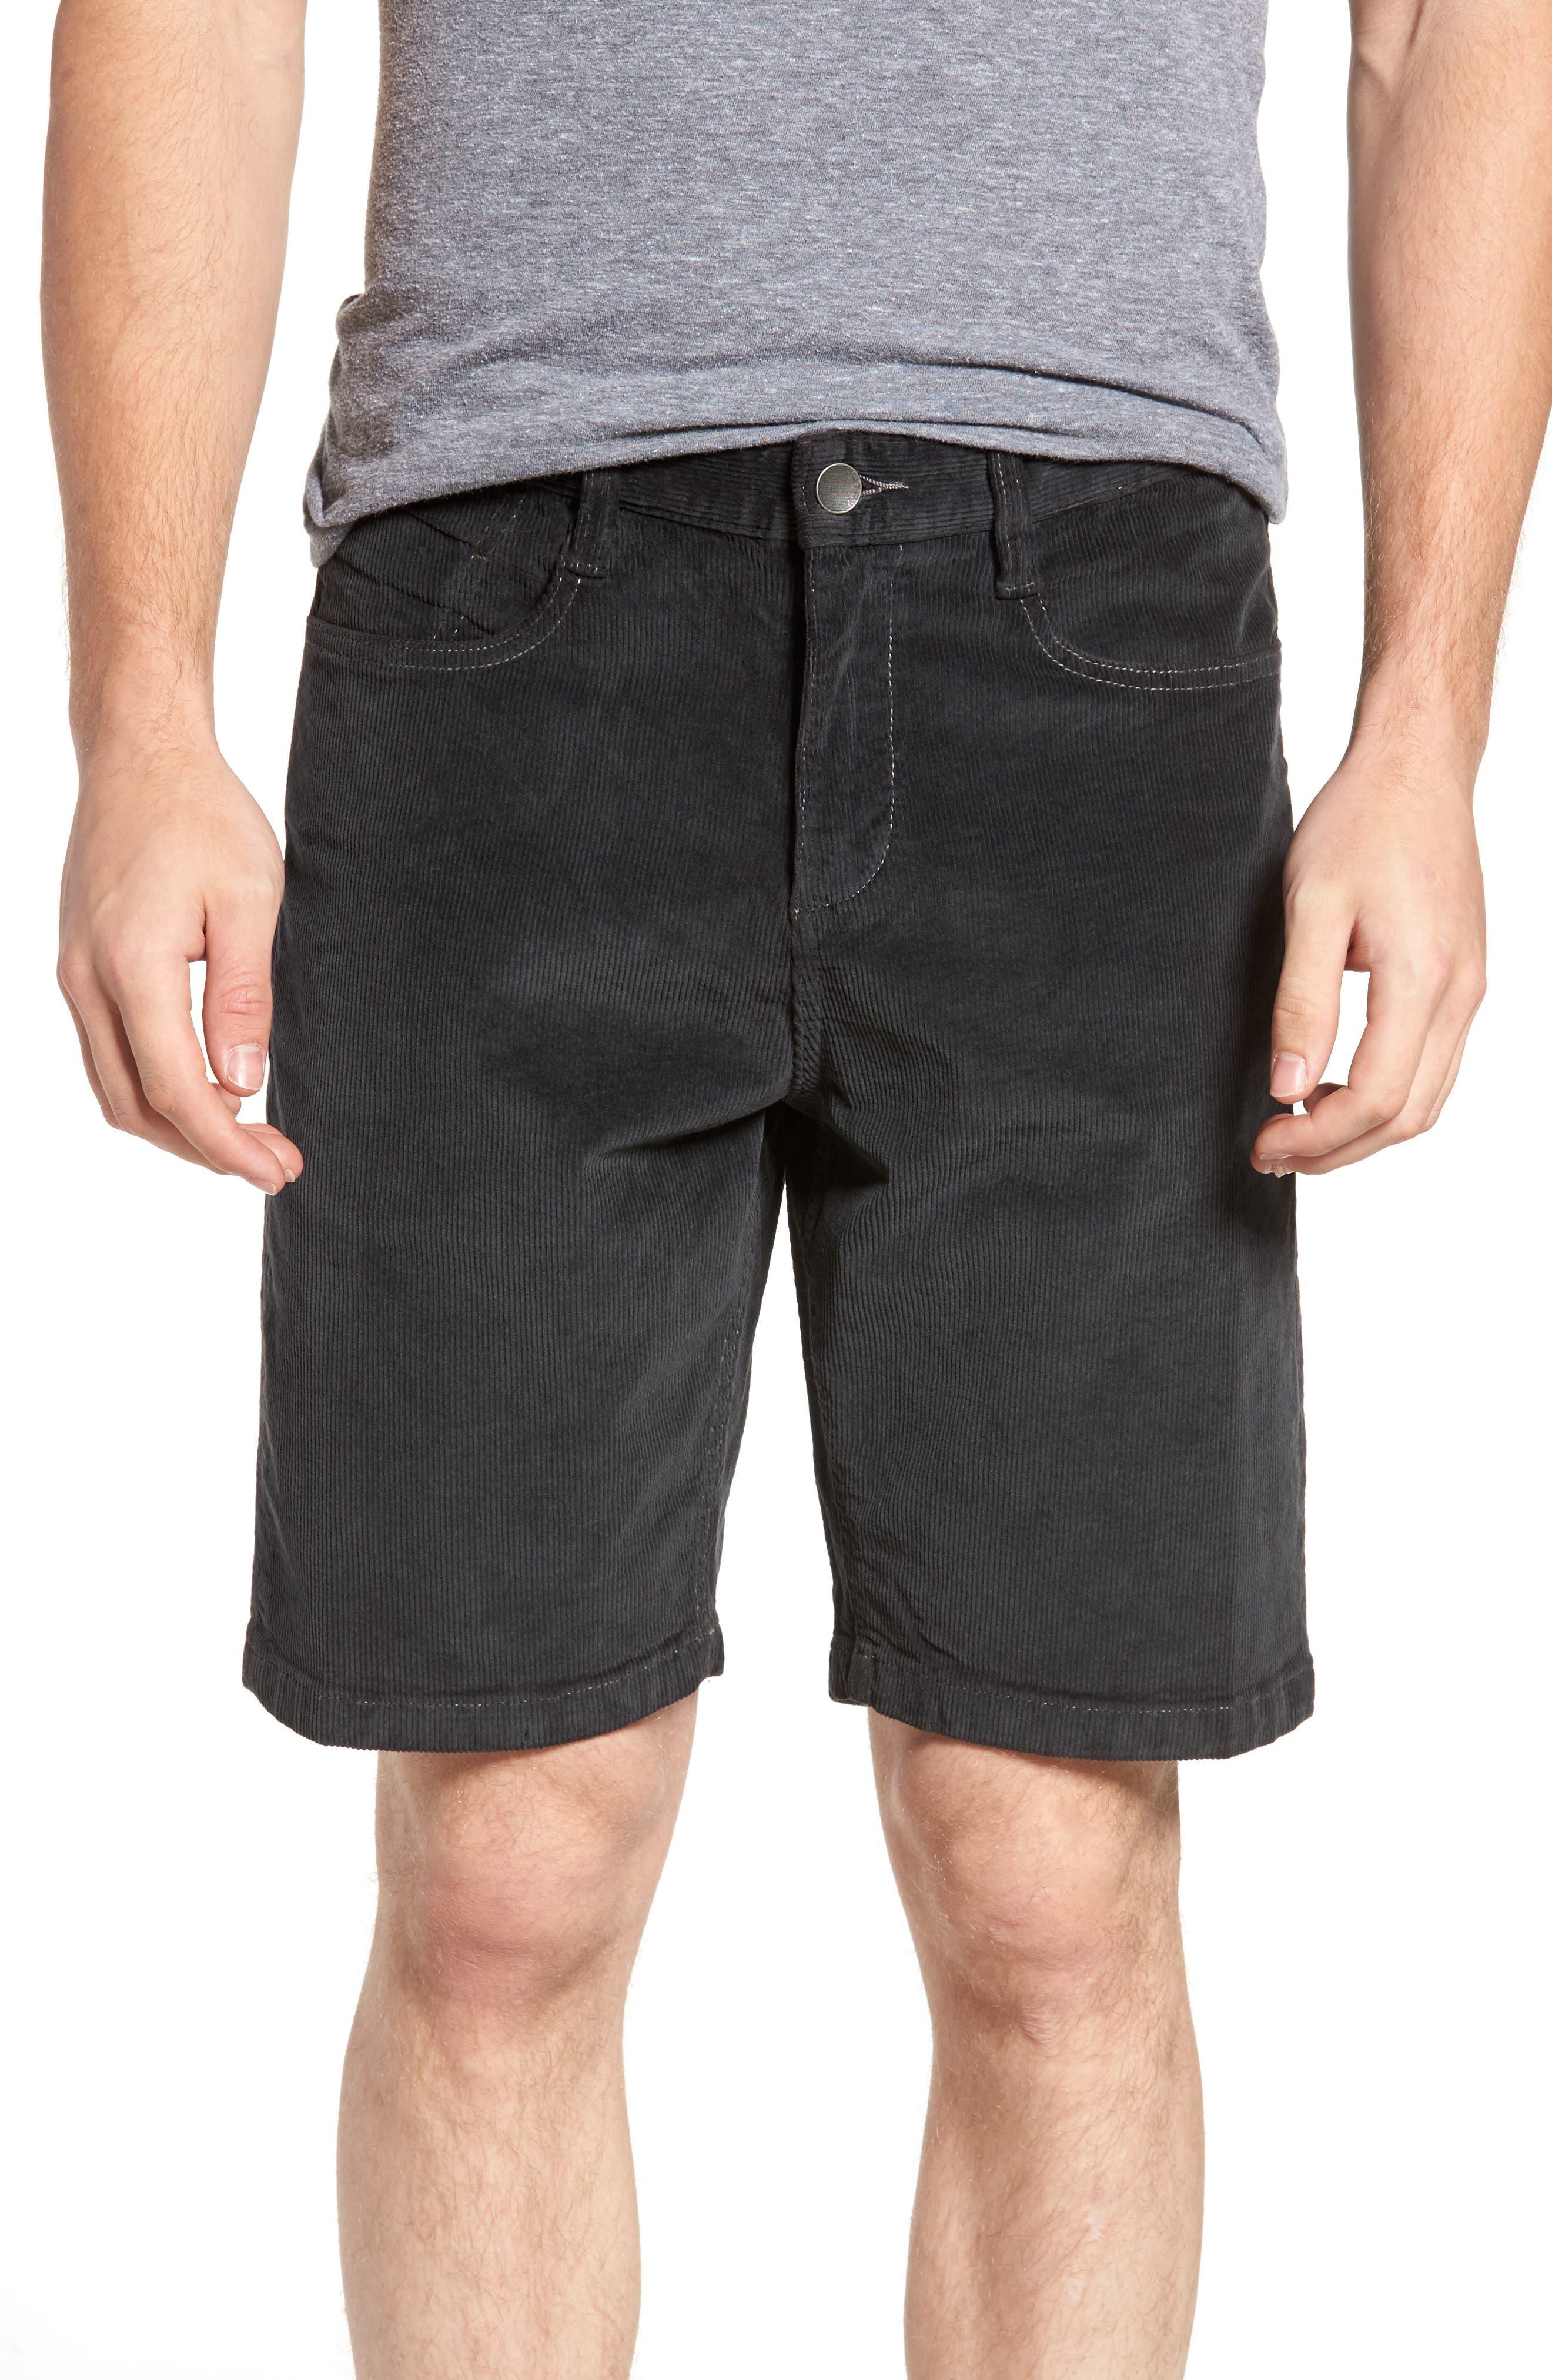 Outsider Corduroy Shorts,                         Main,                         color, 010